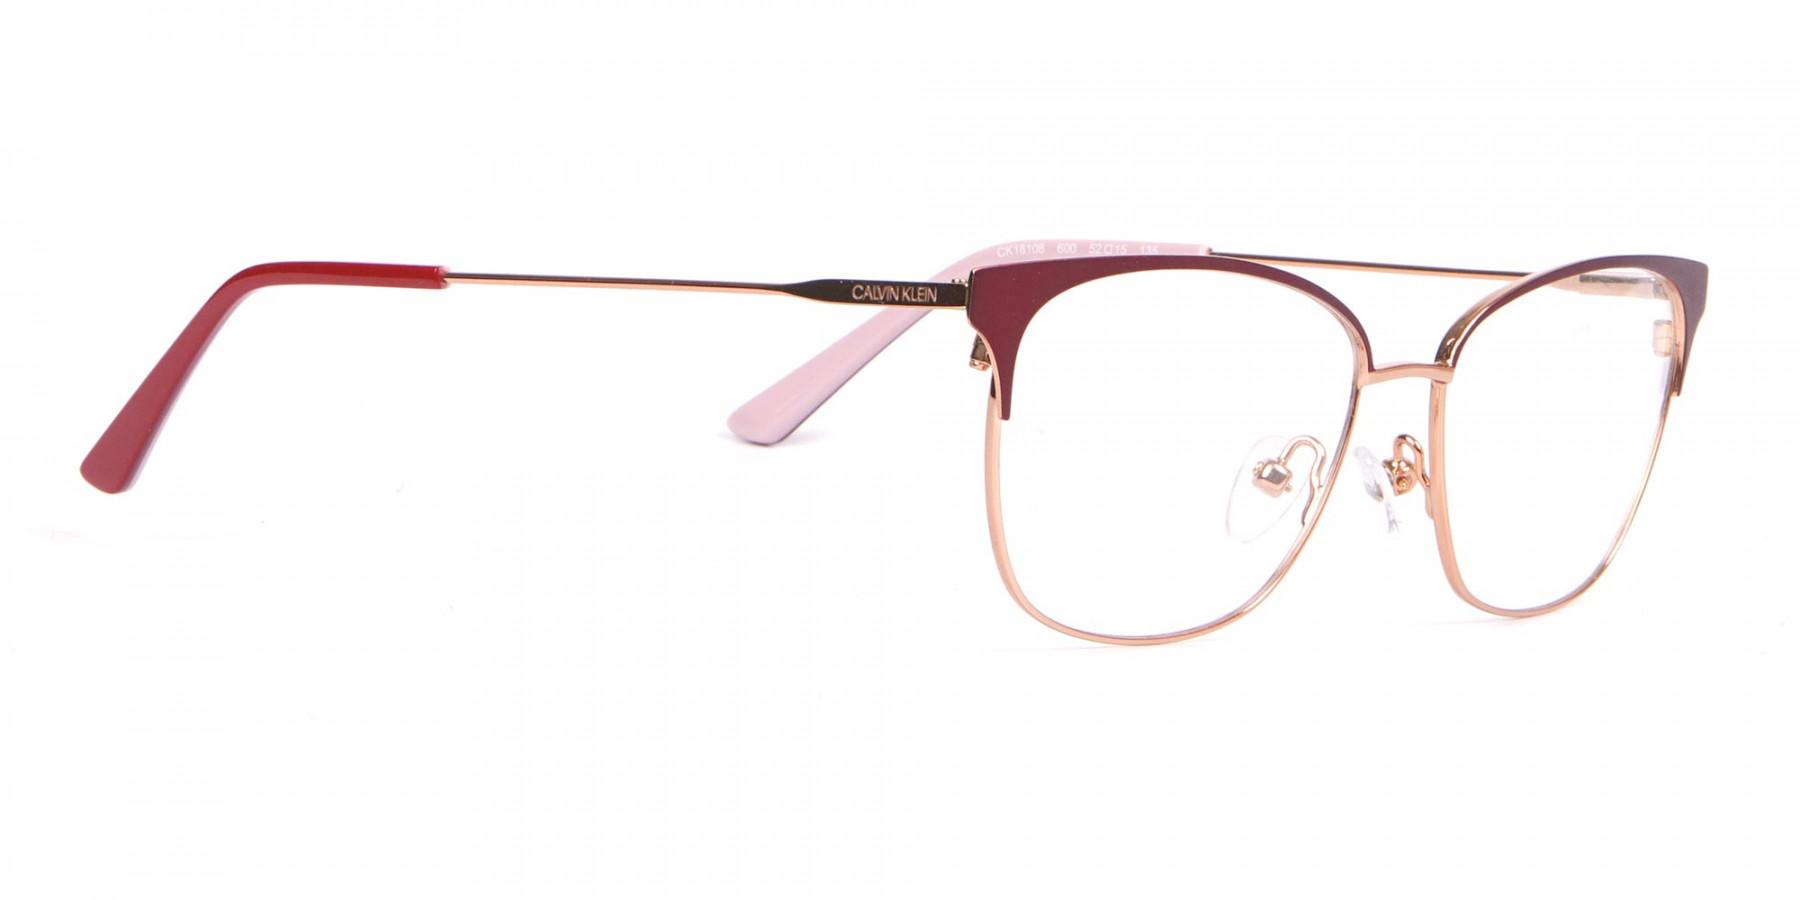 Calvin Klein CK18108 Women Rectangular Metal Glasses Red-1